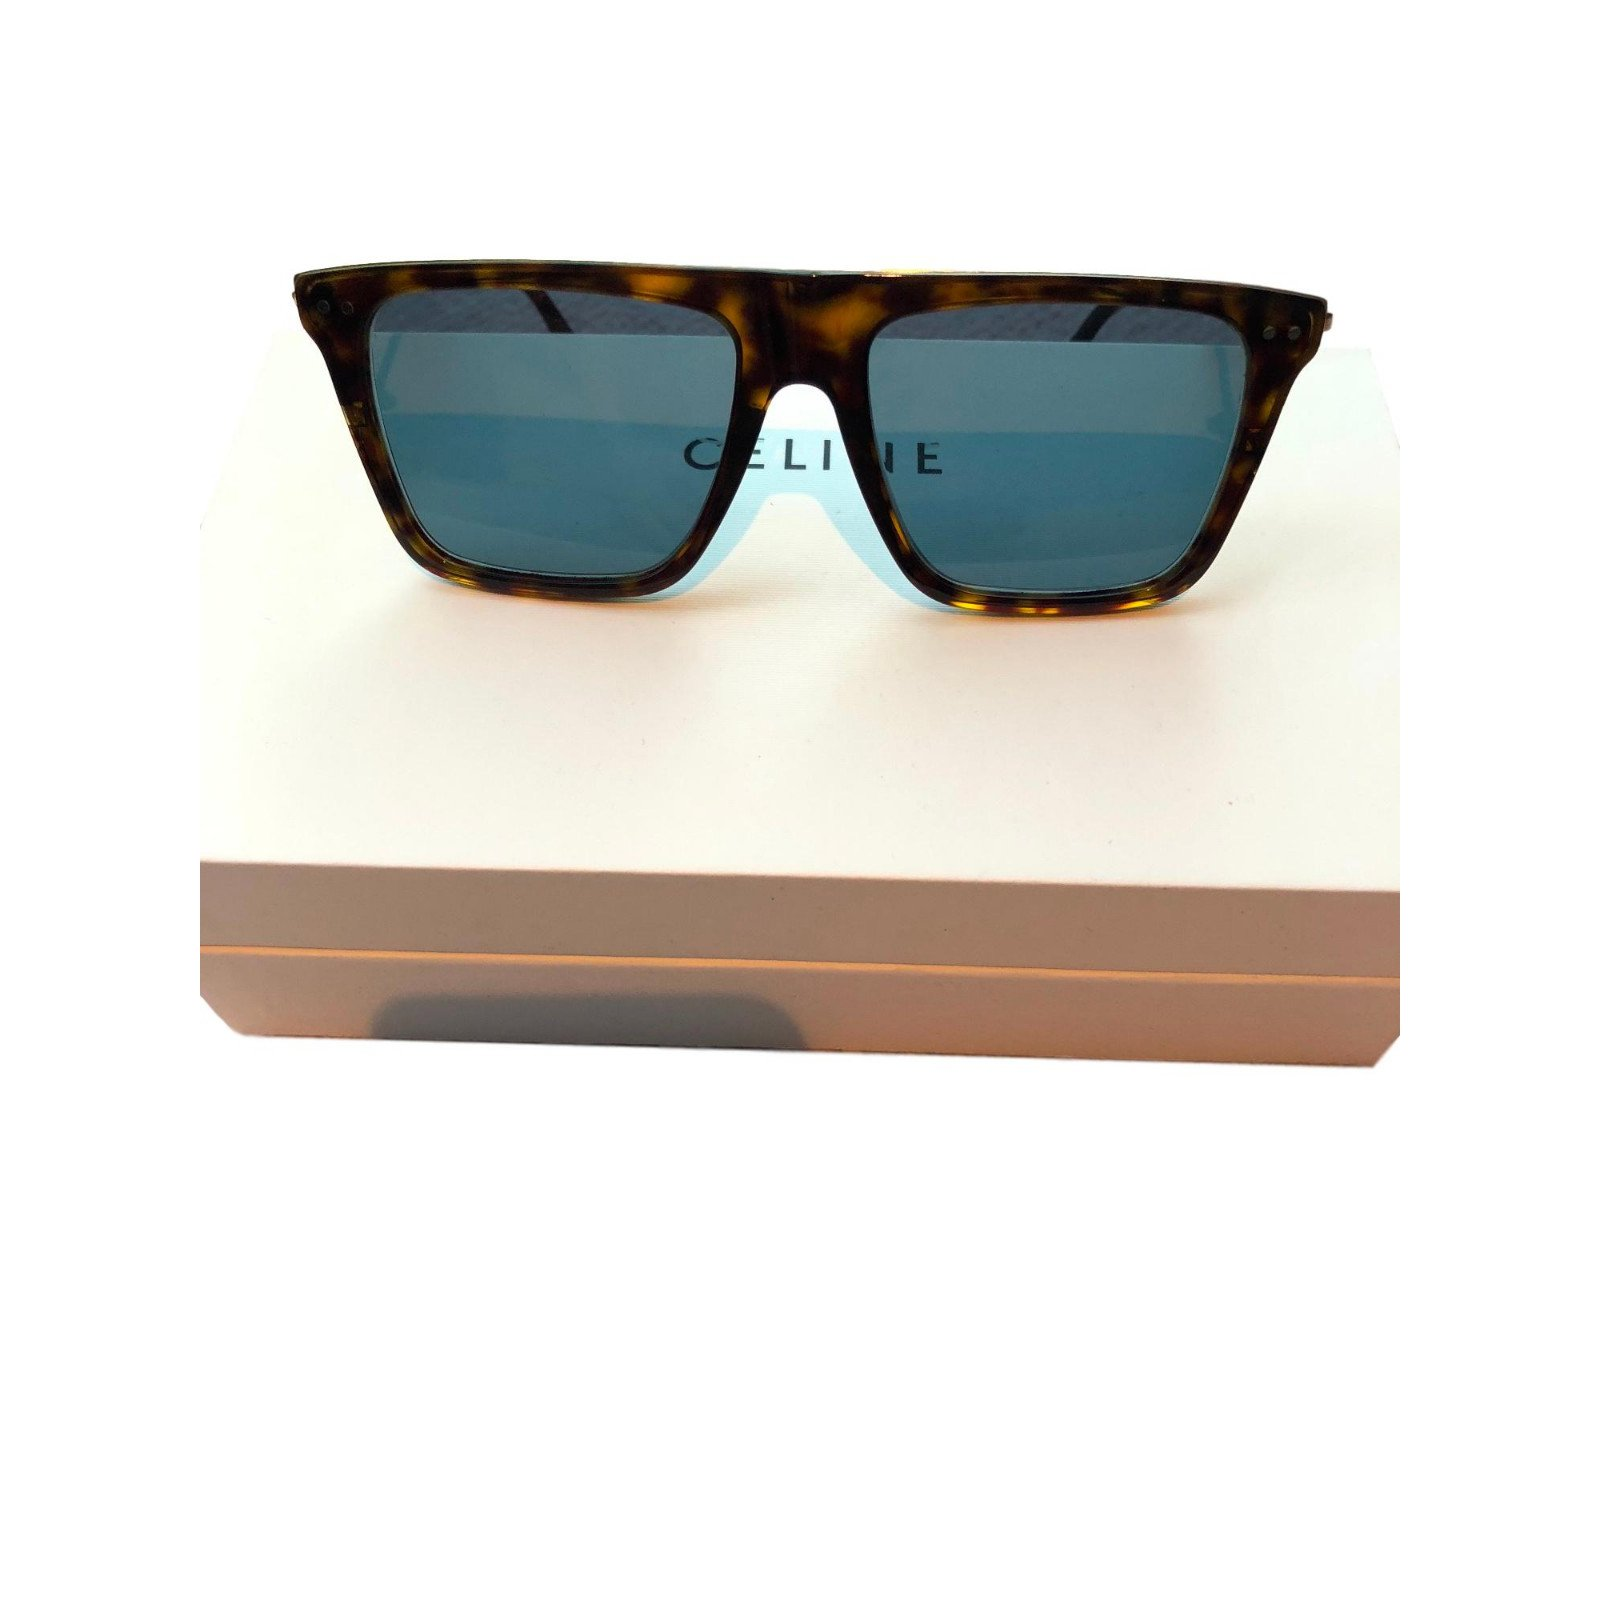 53ca897ab20c Céline Squared-aviator Sunglasses Metal Brown ref.77035 - Joli Closet